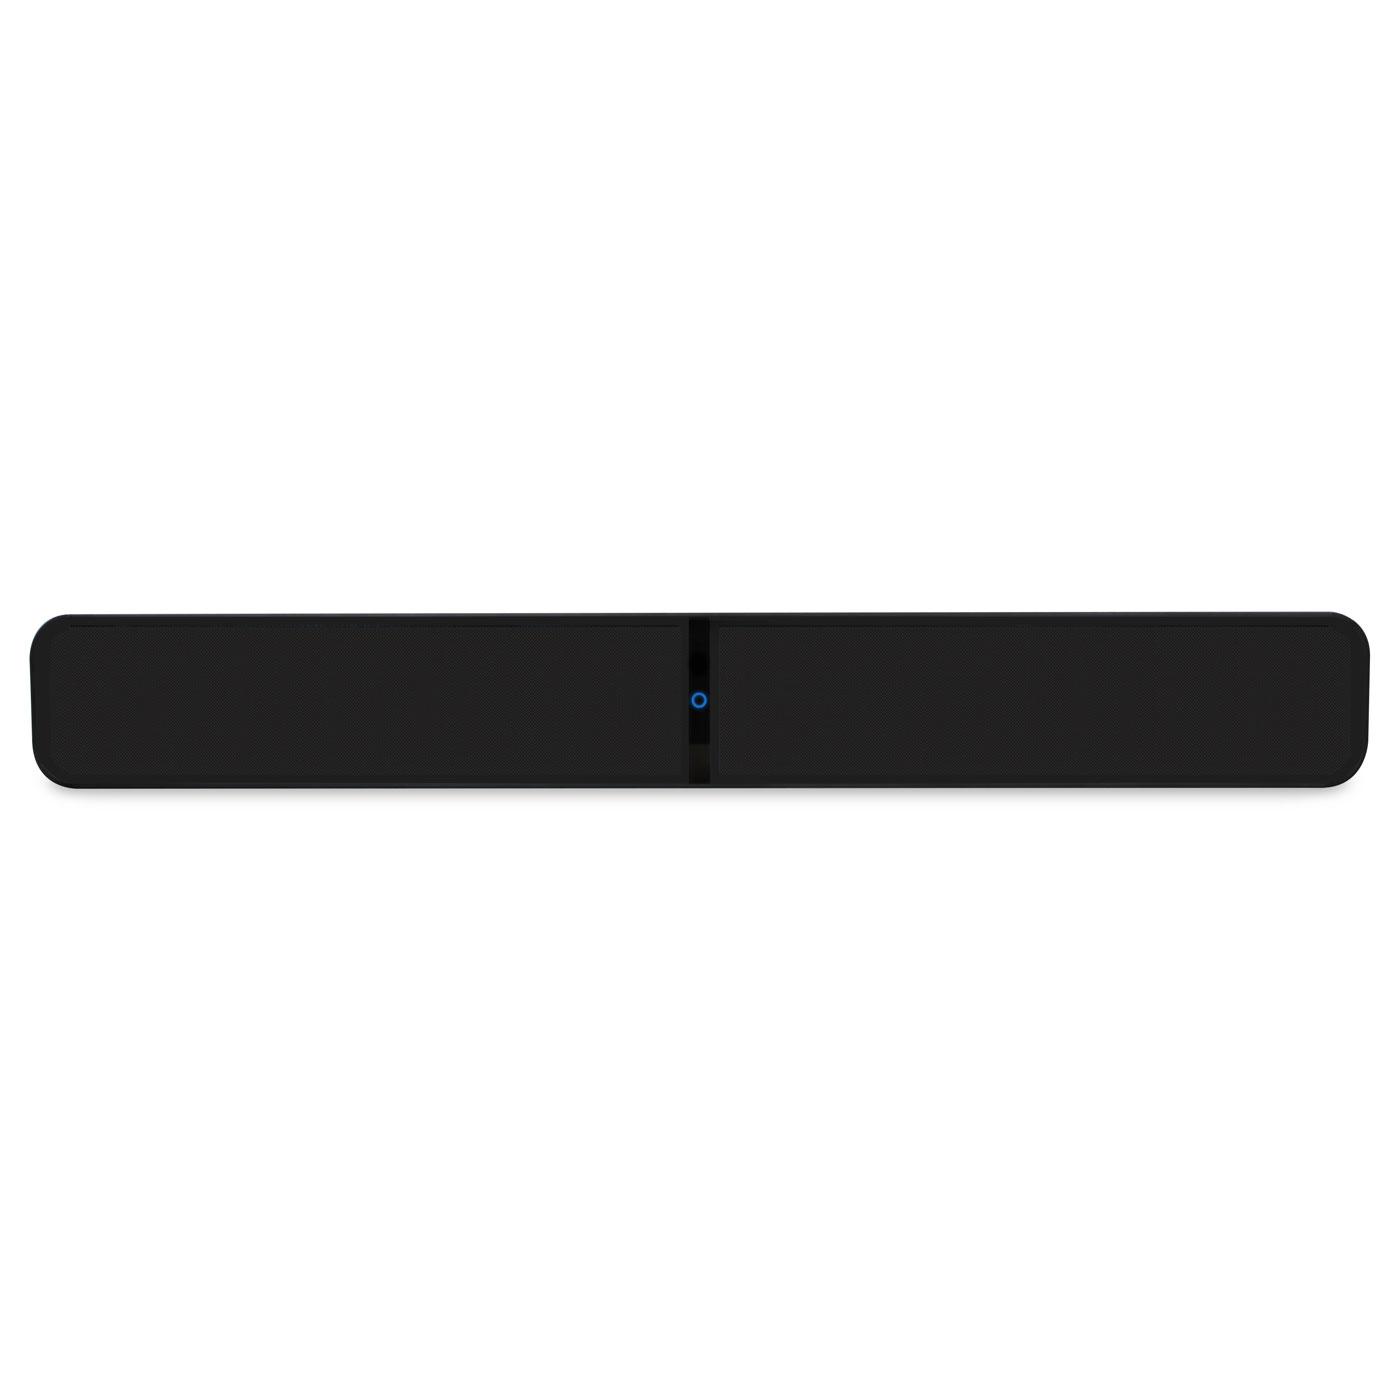 Barre de son Bluesound Pulse Soundbar Barre de son 120W Hi-Res Audio Wi-Fi, Ethernet et Bluetooth AptX